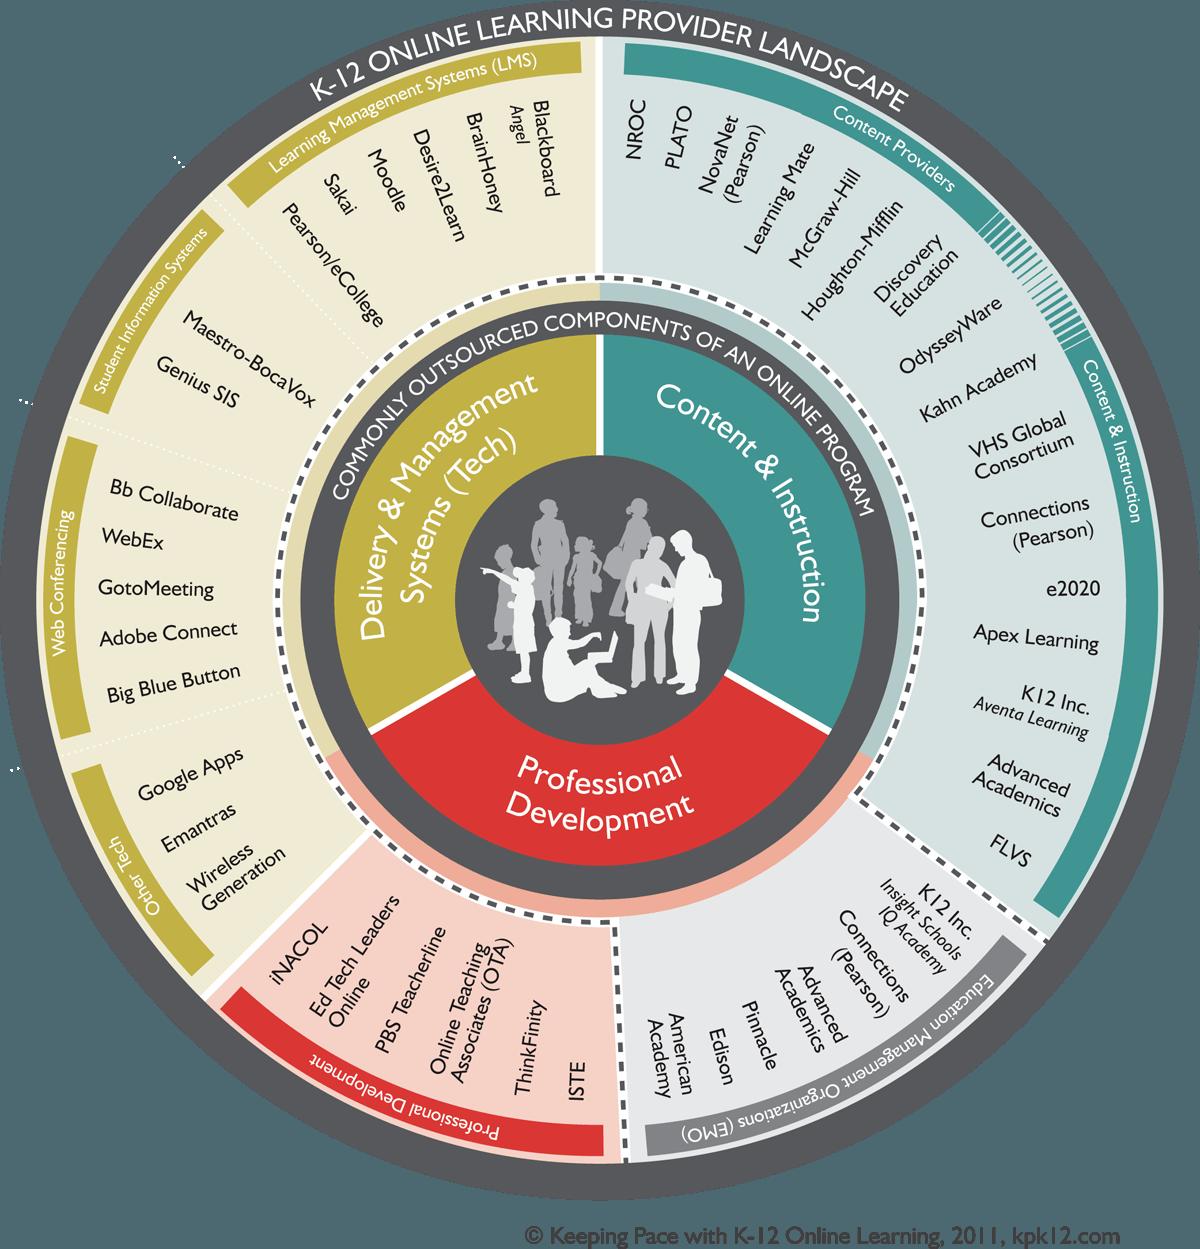 The K-12 Online Learning Provider Landscape Infographic